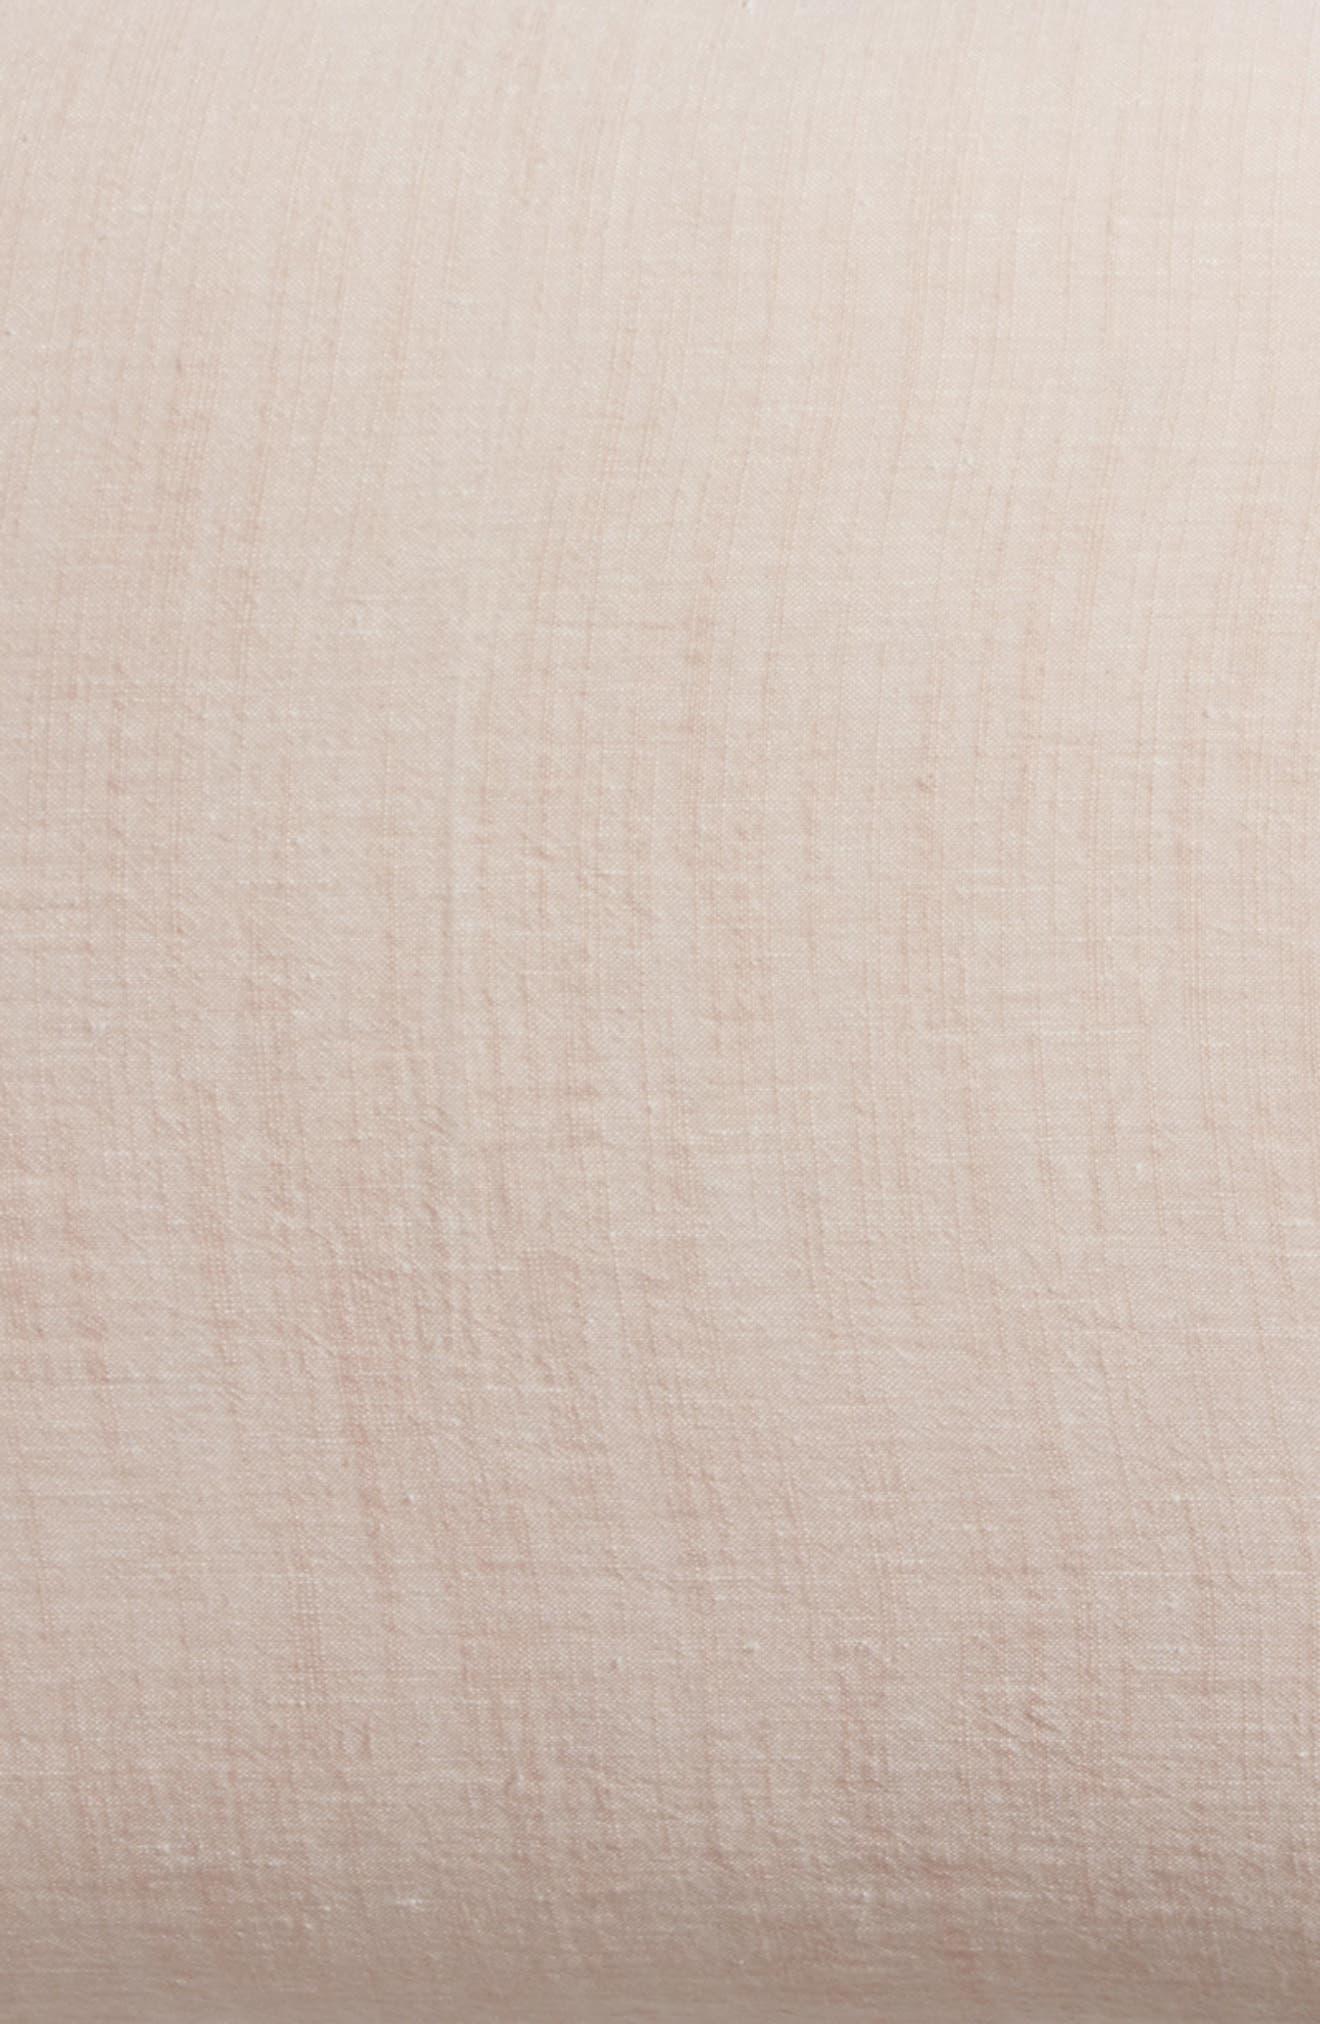 Relaxed Cotton & Linen Sham,                             Alternate thumbnail 5, color,                             Pink Wisp